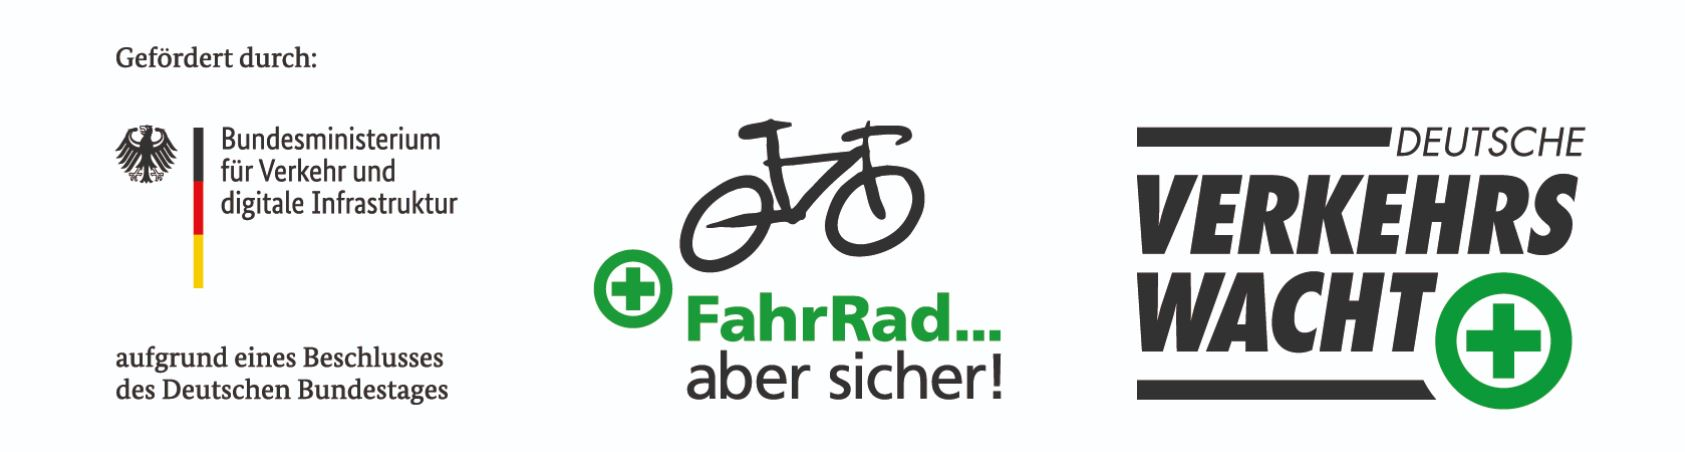 2020 Logo FahrRad DVW